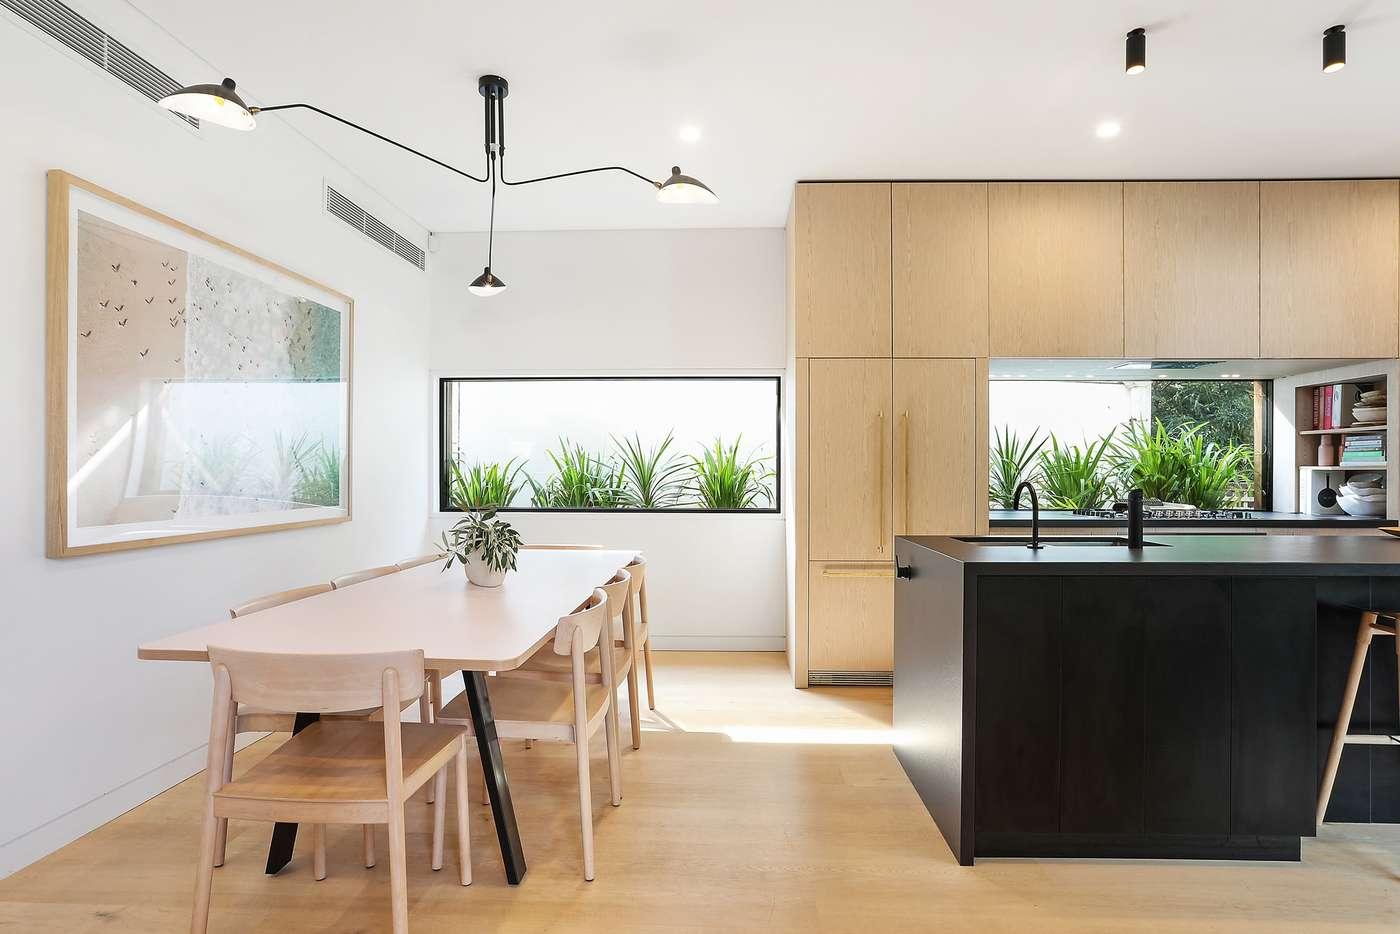 Main view of Homely house listing, 77 Beach Road, Bondi Beach NSW 2026